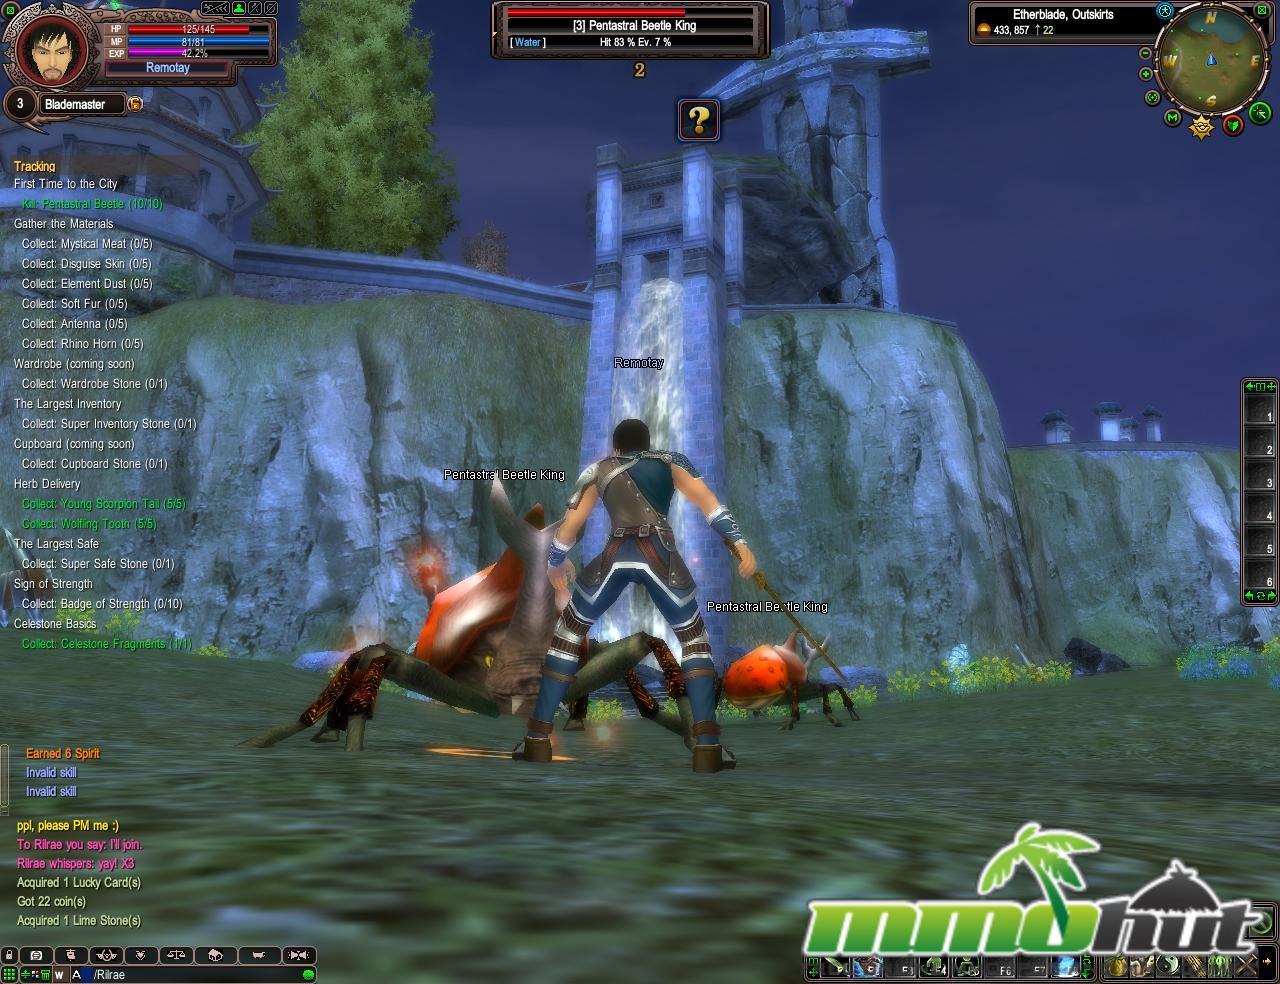 Top 10 Best 3D MMORPGs / MMOs Perfect World